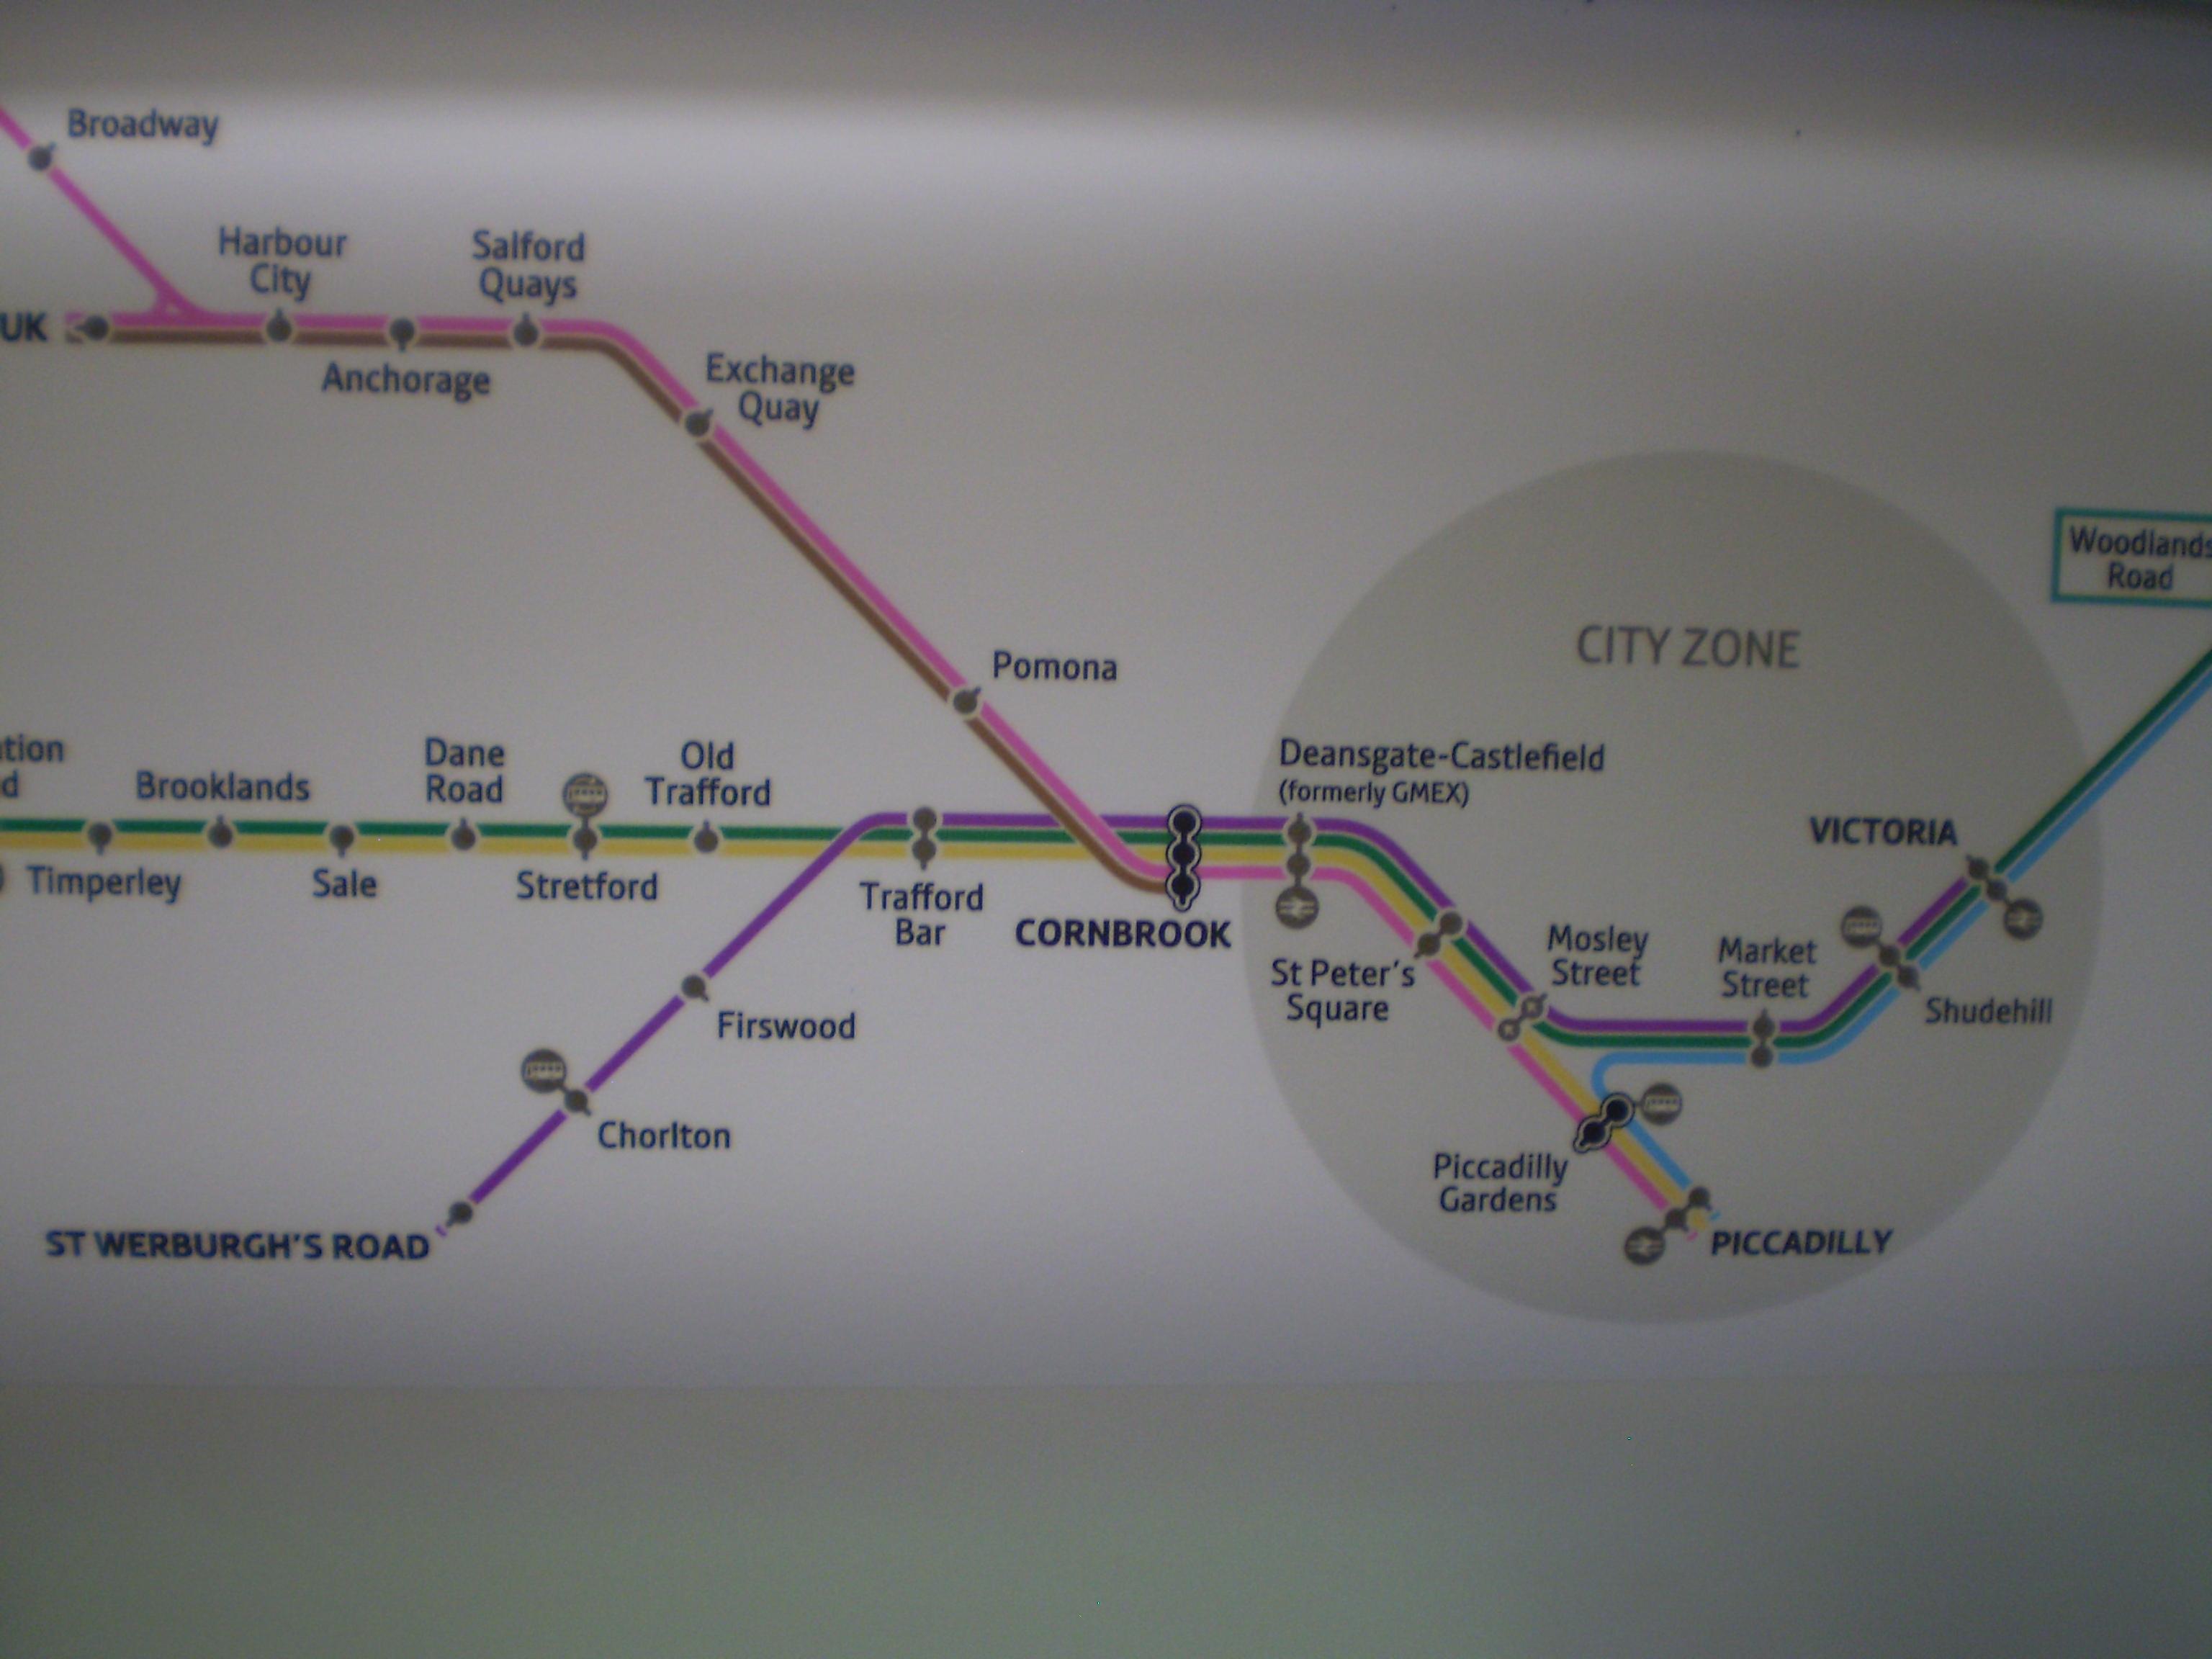 Chorlton Metrolink photos richardfrosty Richard Frost Manchester